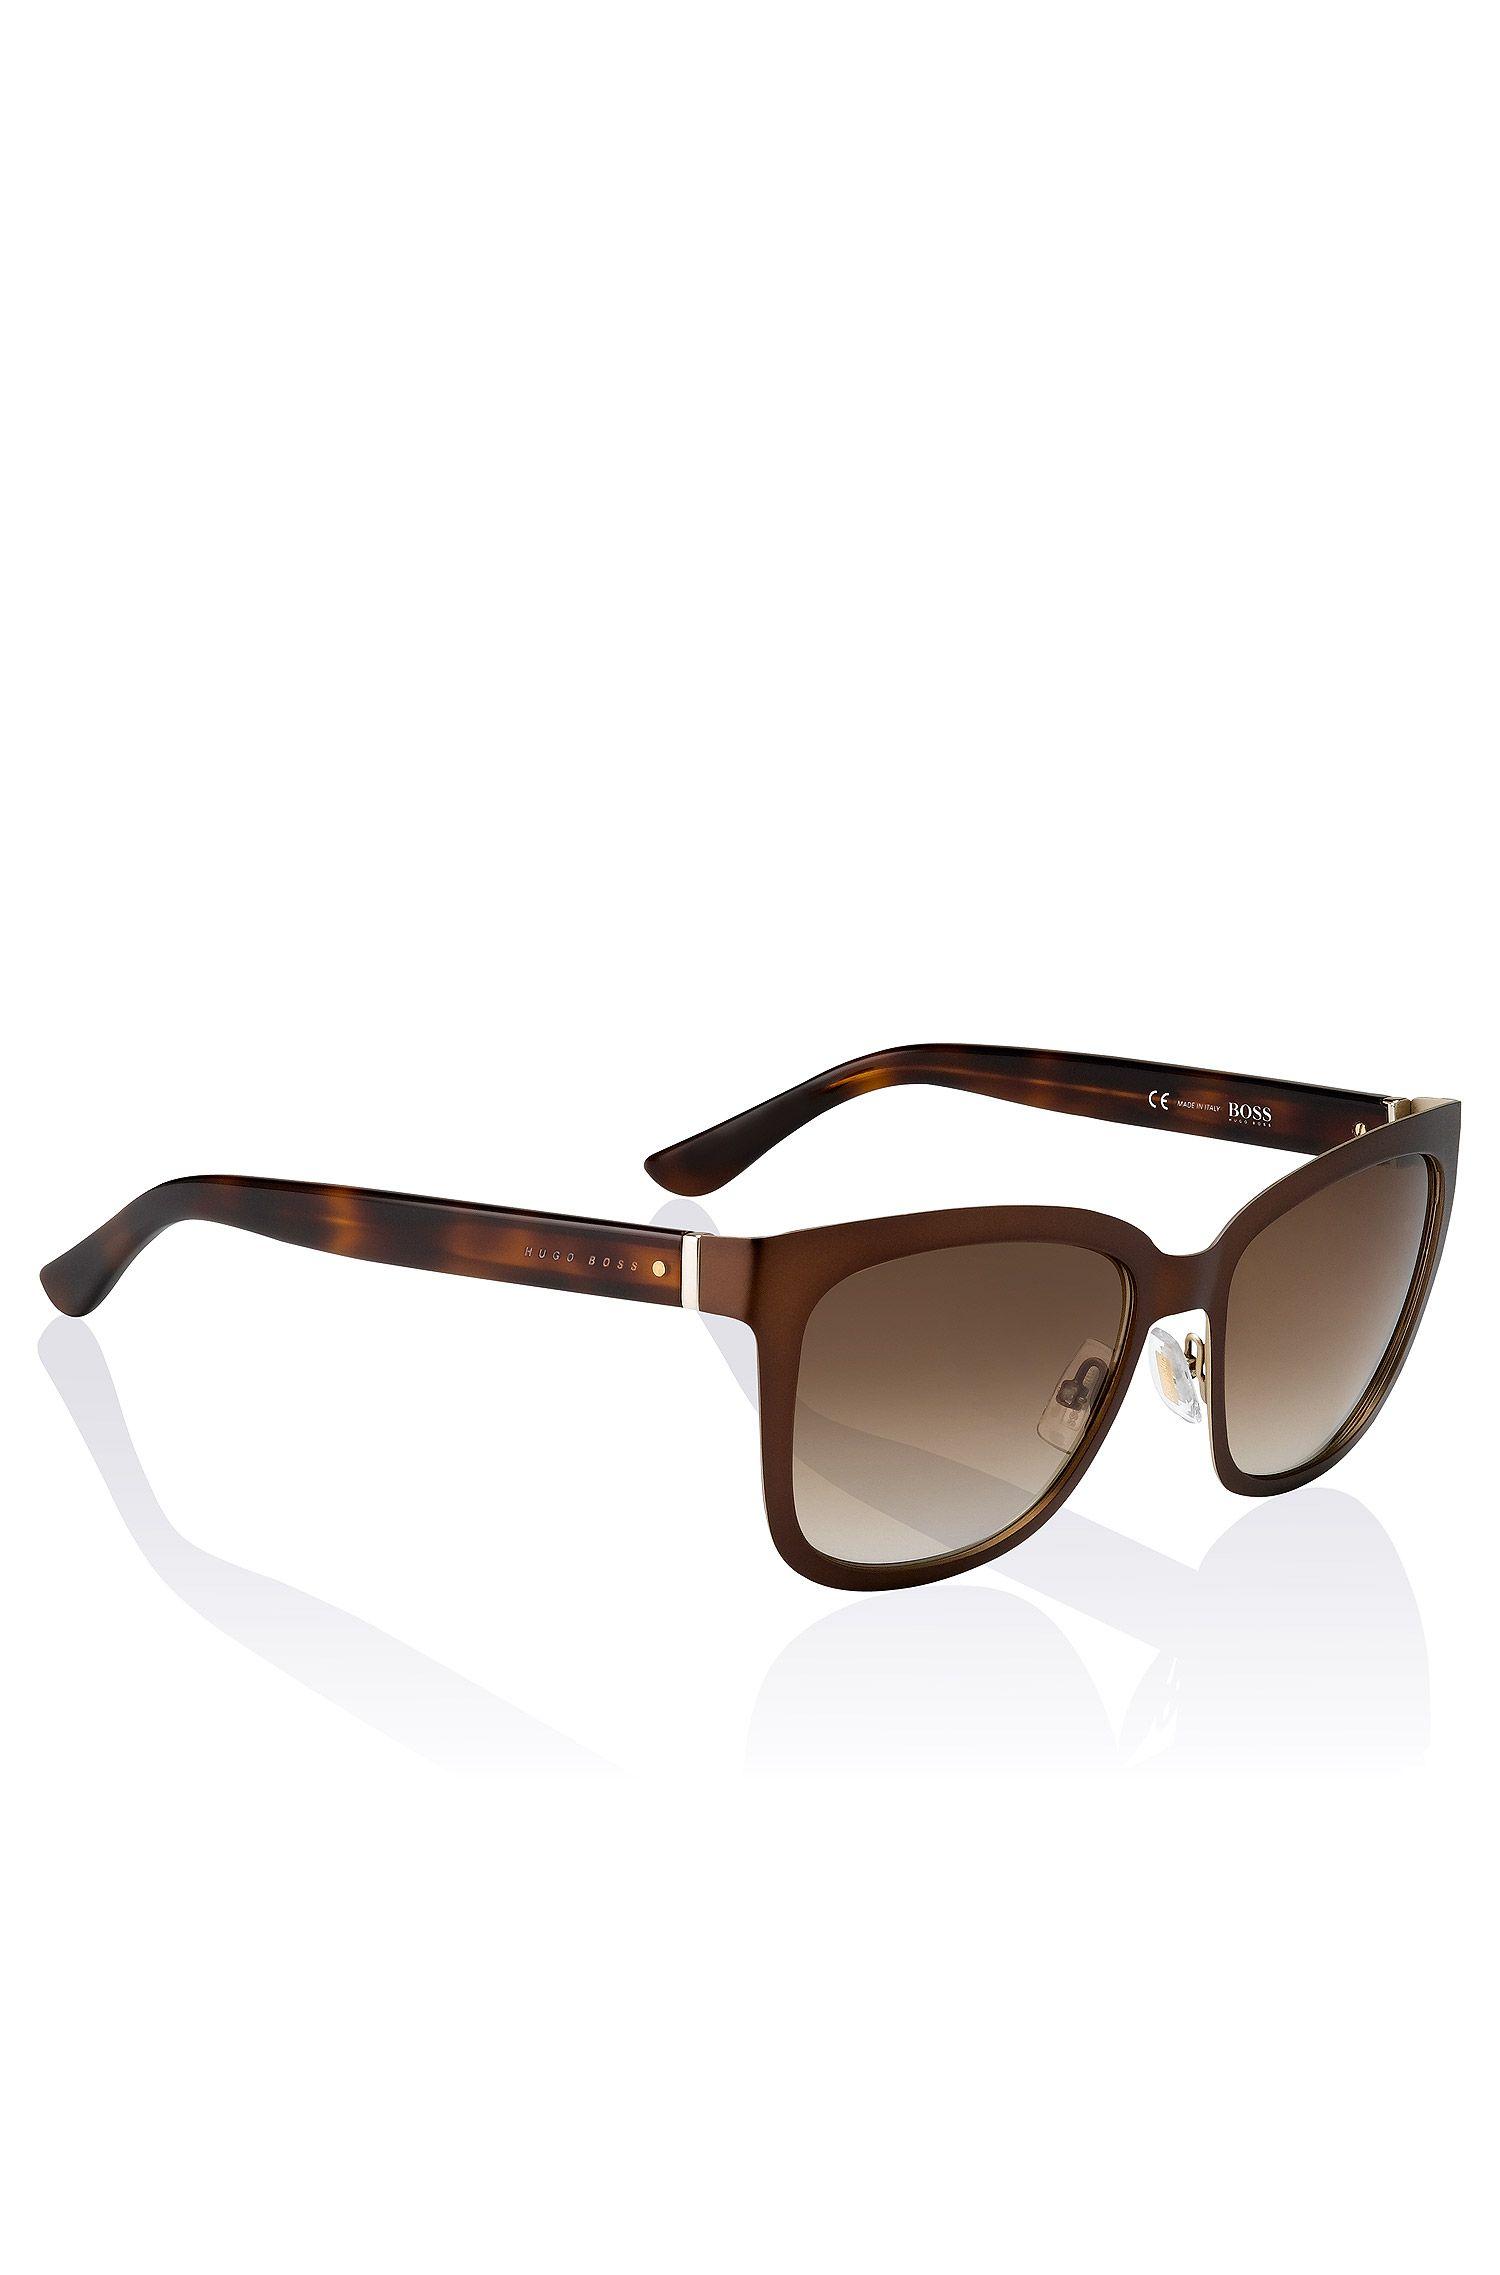 Sonnenbrille ´BOSS 0676` aus Acetat und Metall